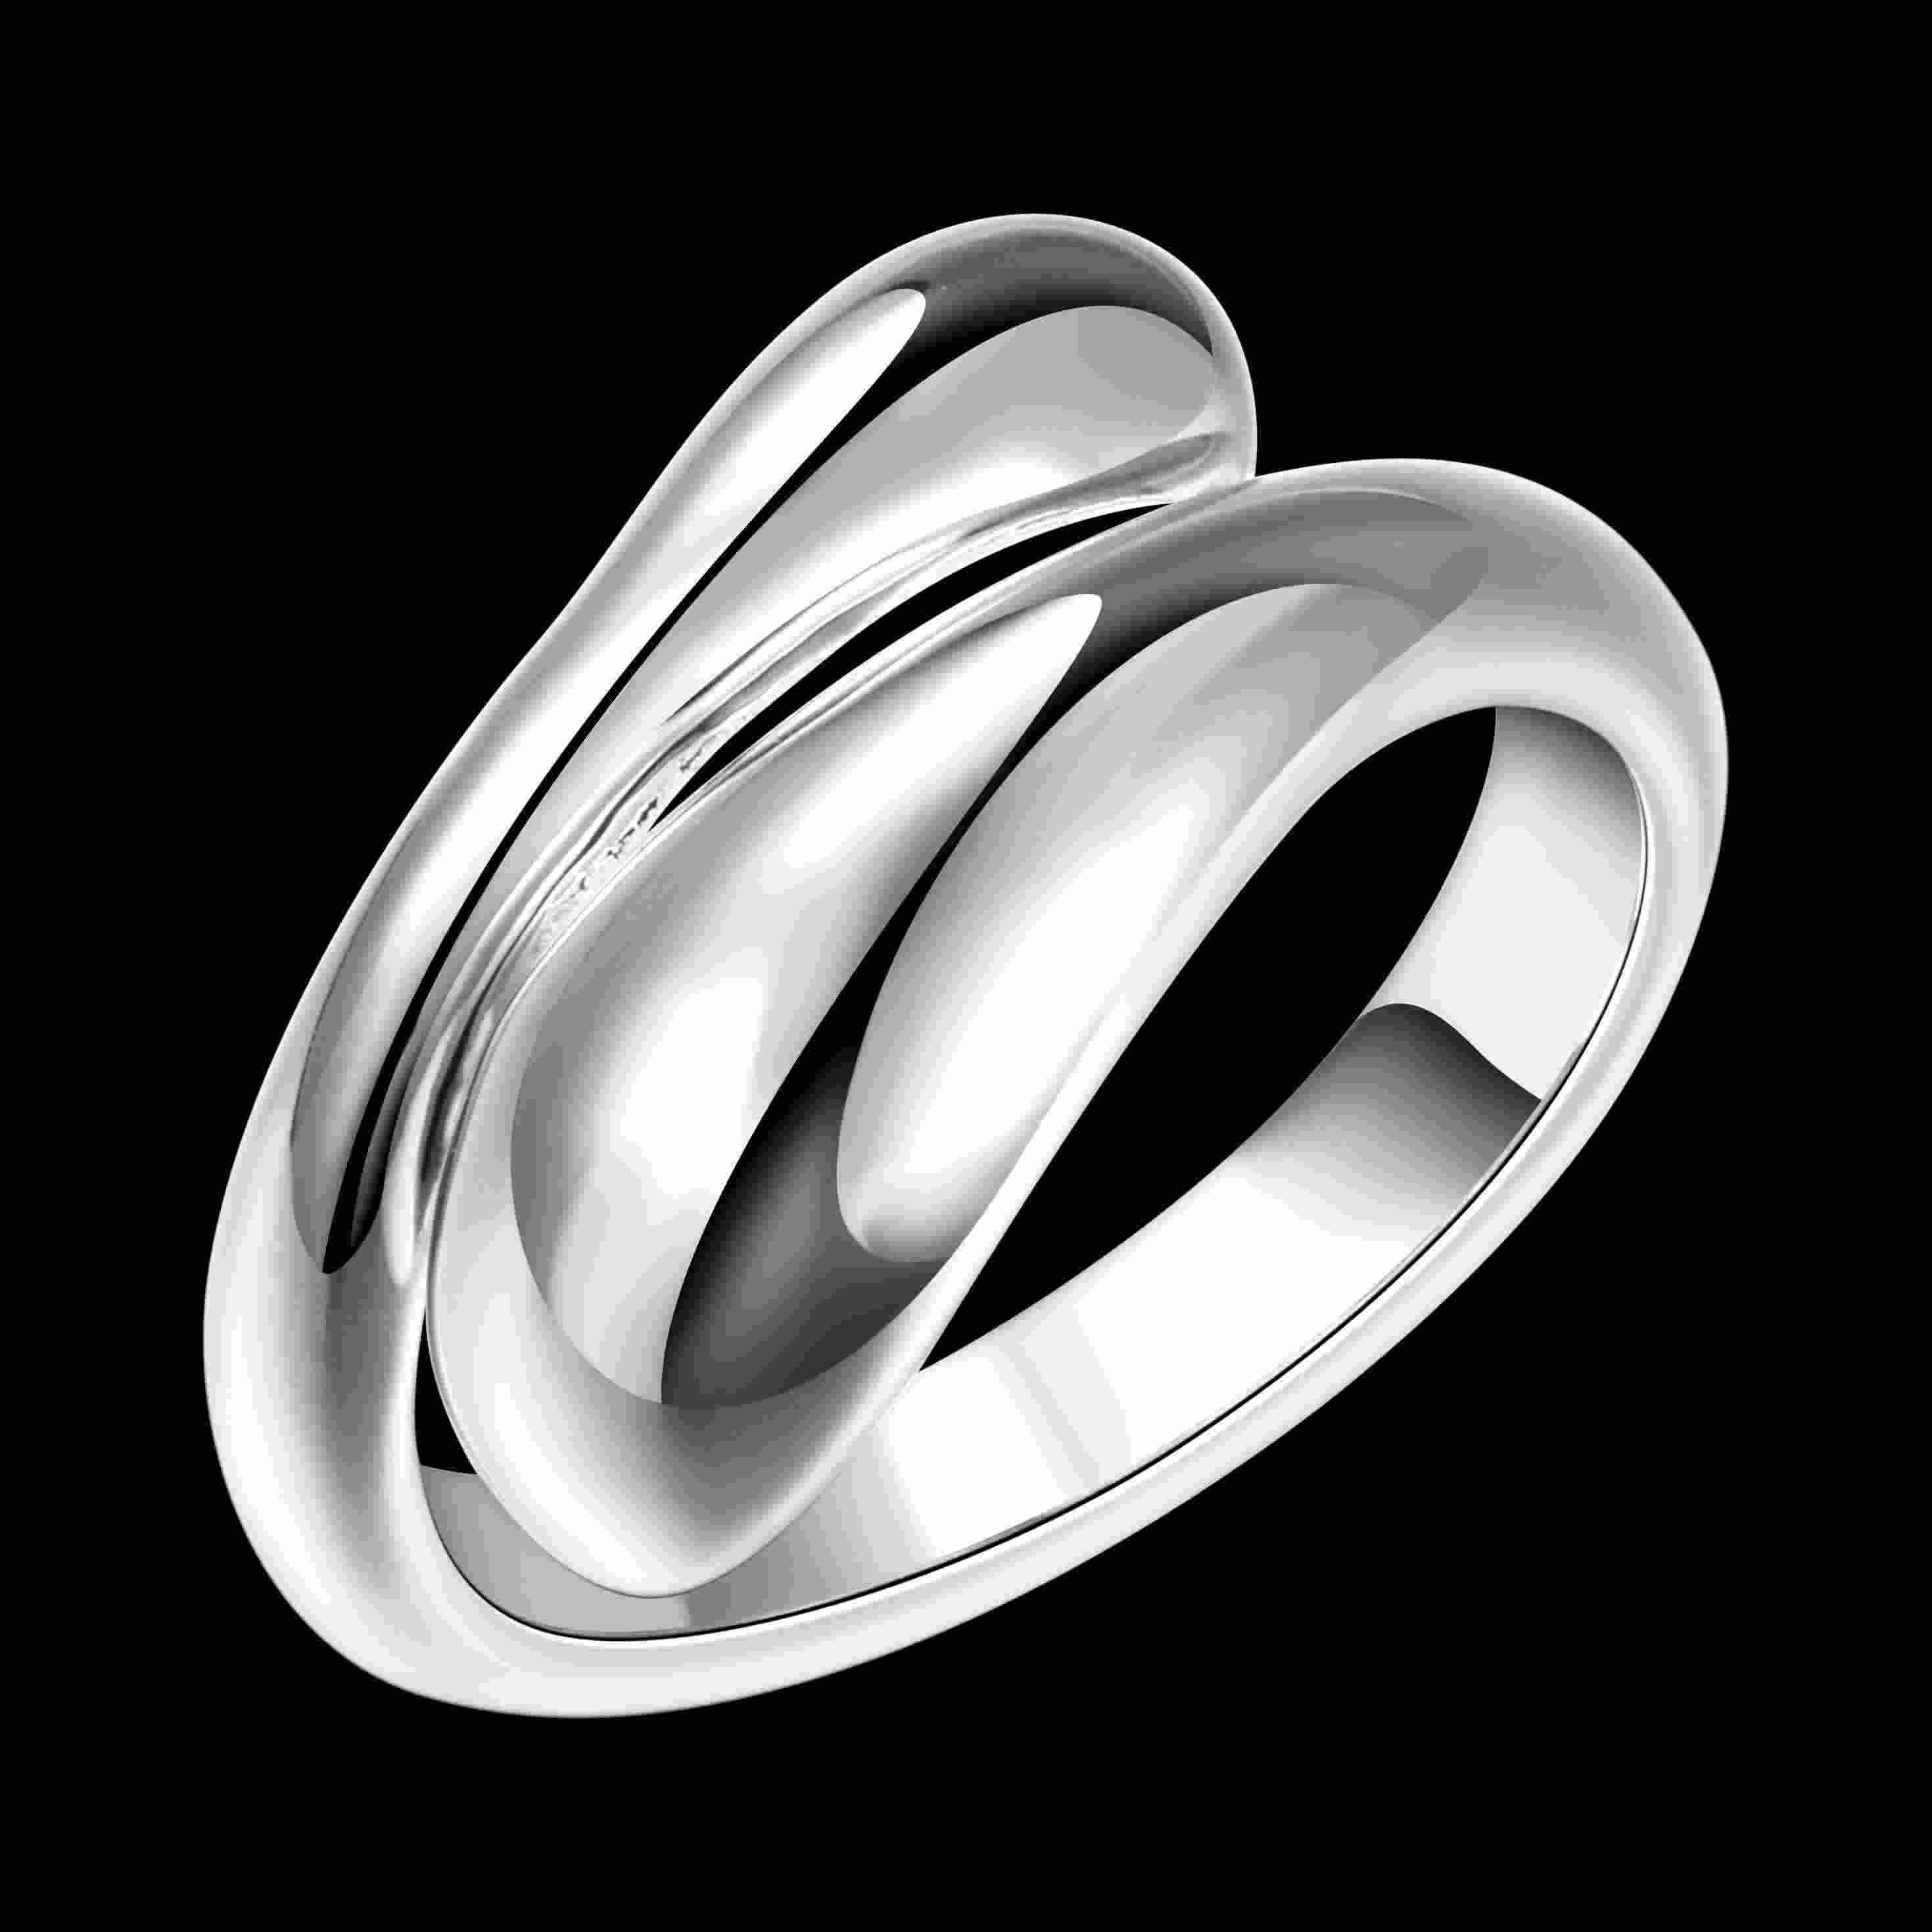 Fashion jewelry silver rings raindrop/waterdrop ring for women/men Drop Shopping Brincos 925 stamp aneis bijouterie